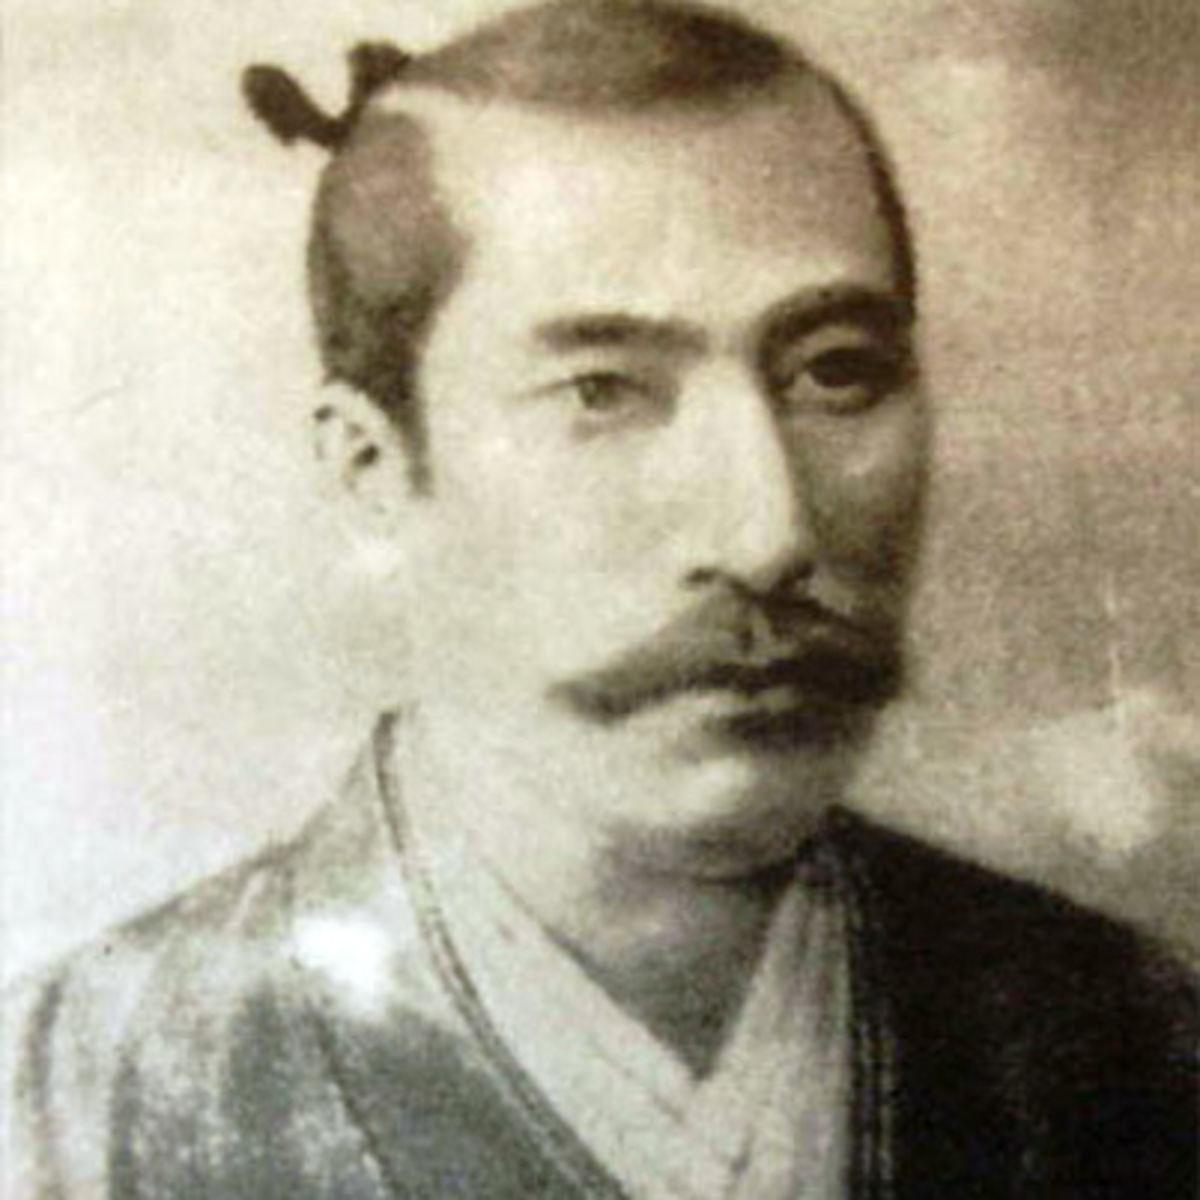 oda nobunaga, japan italy bridge, japan italy, japan tradition, samurai, tradizione giappone, giappone, giapponese